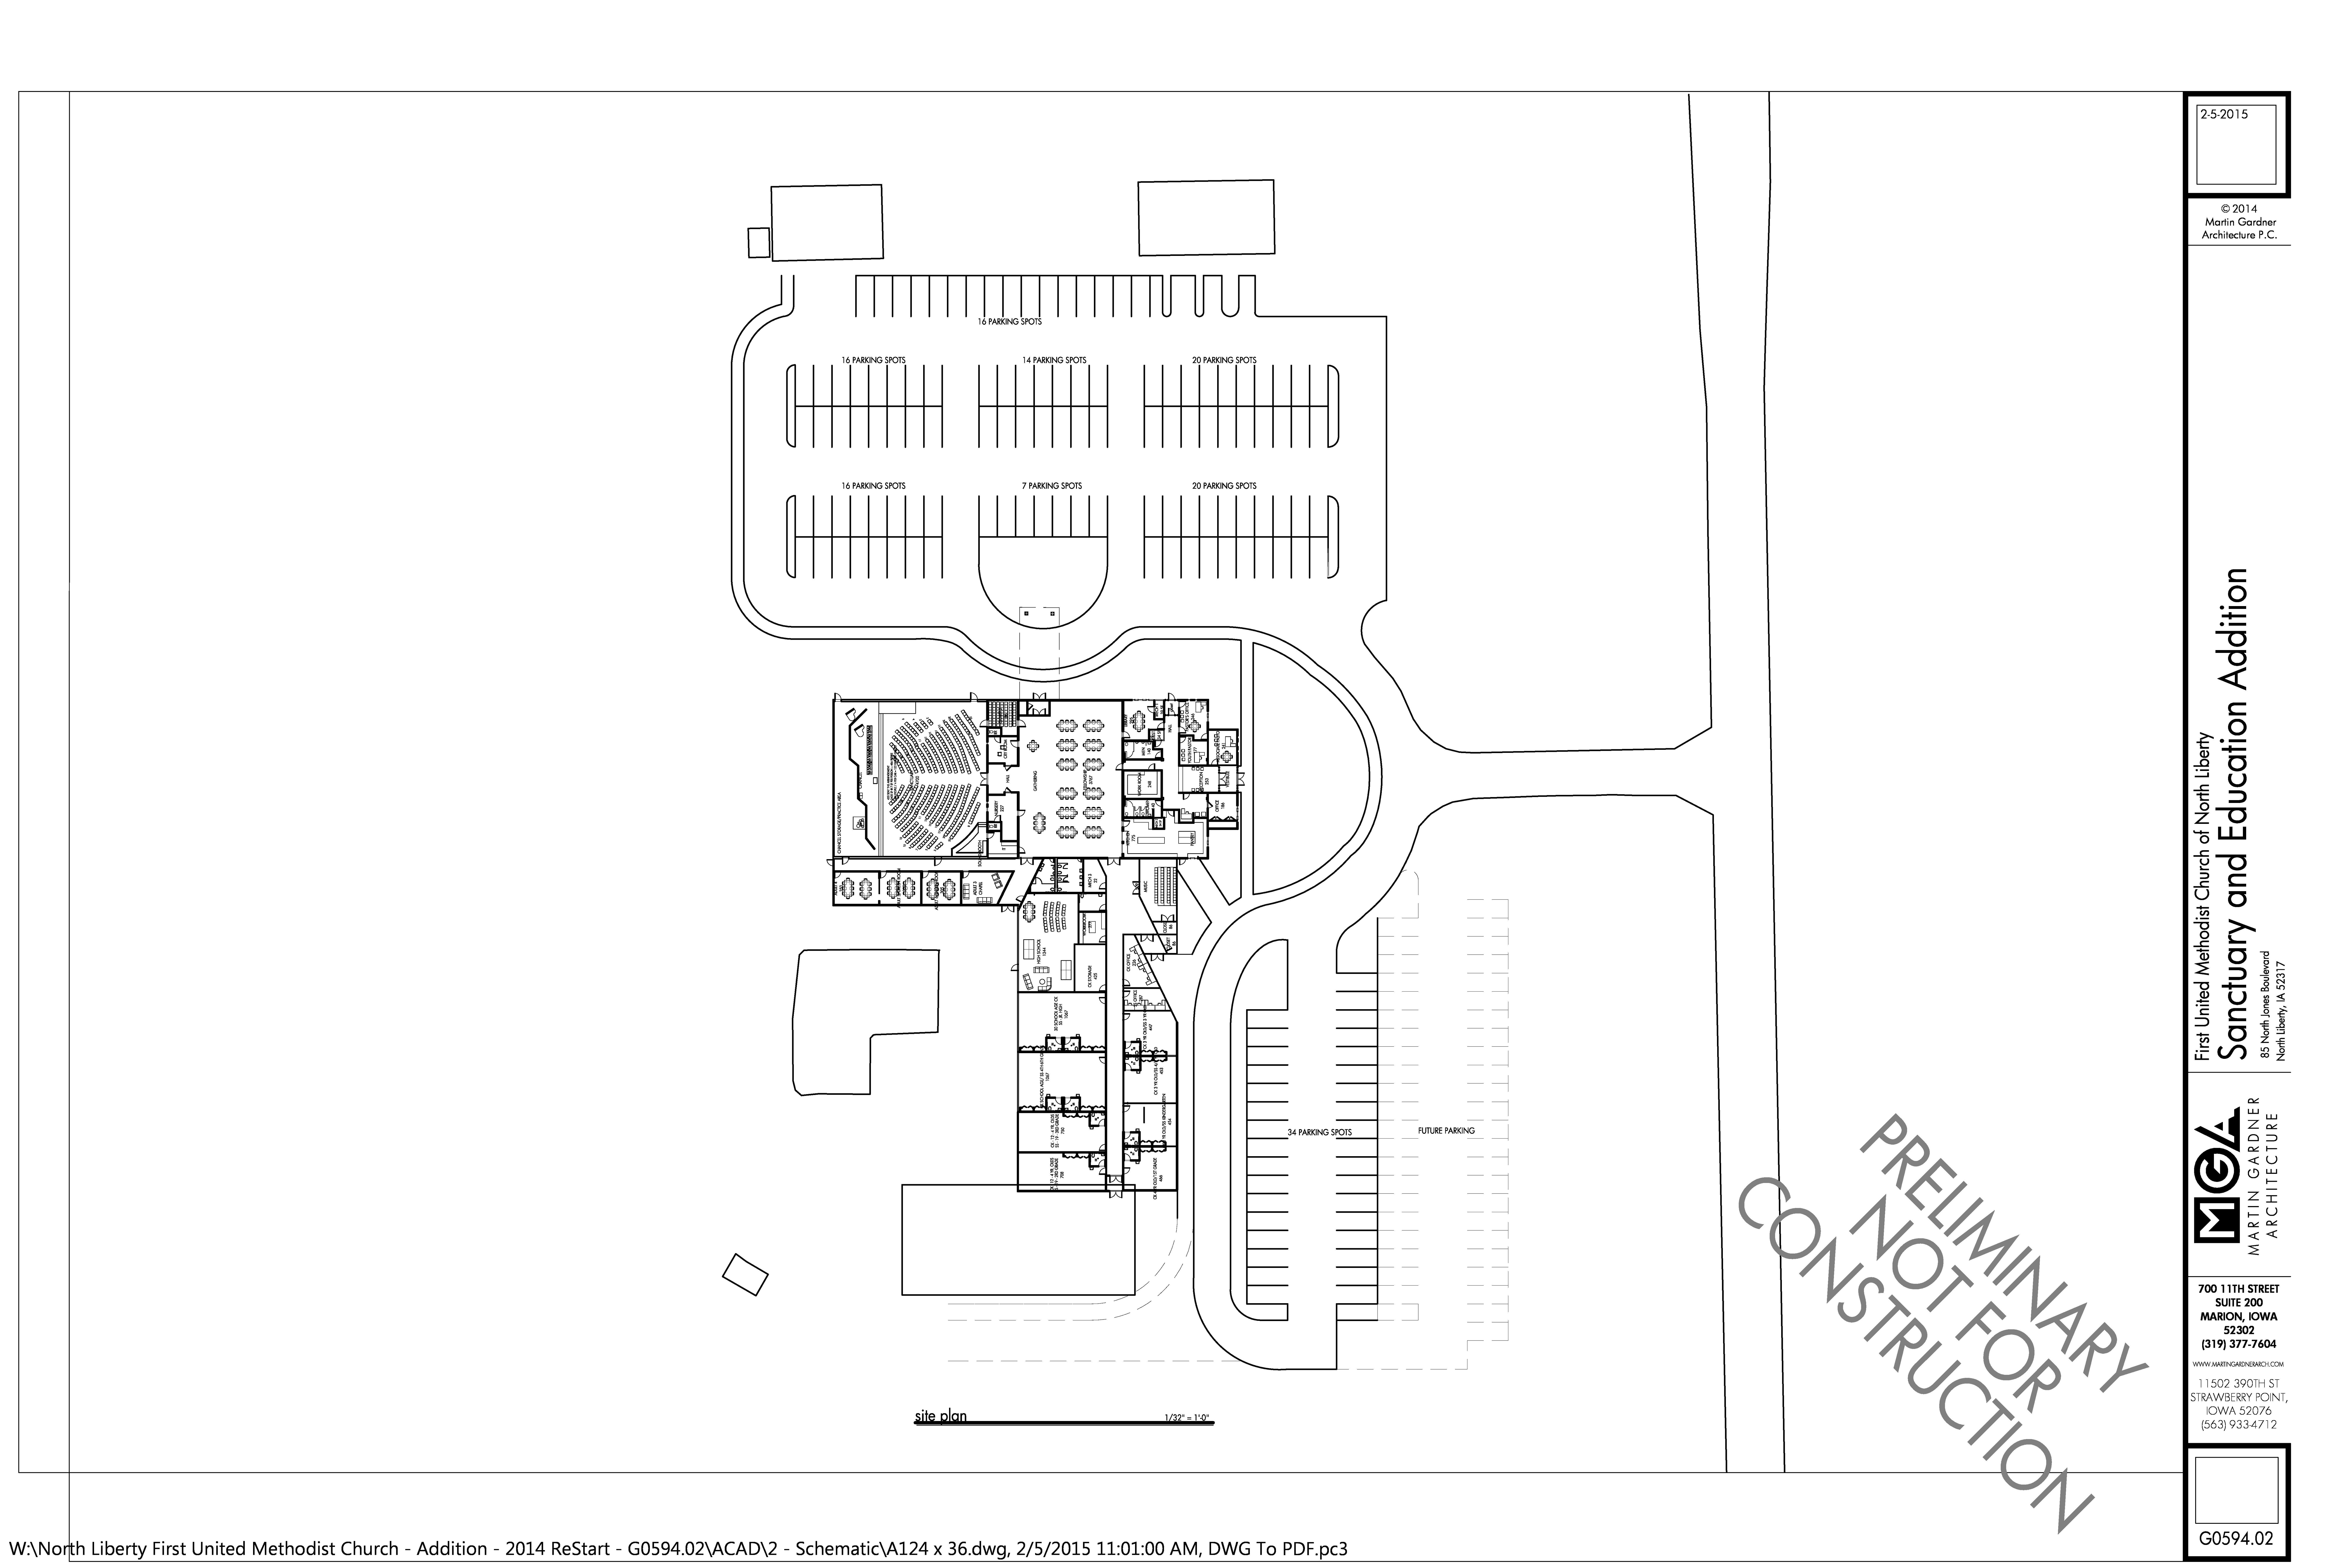 Hear ye hear ye first united methodist church of north liberty site plan sanctuary malvernweather Choice Image